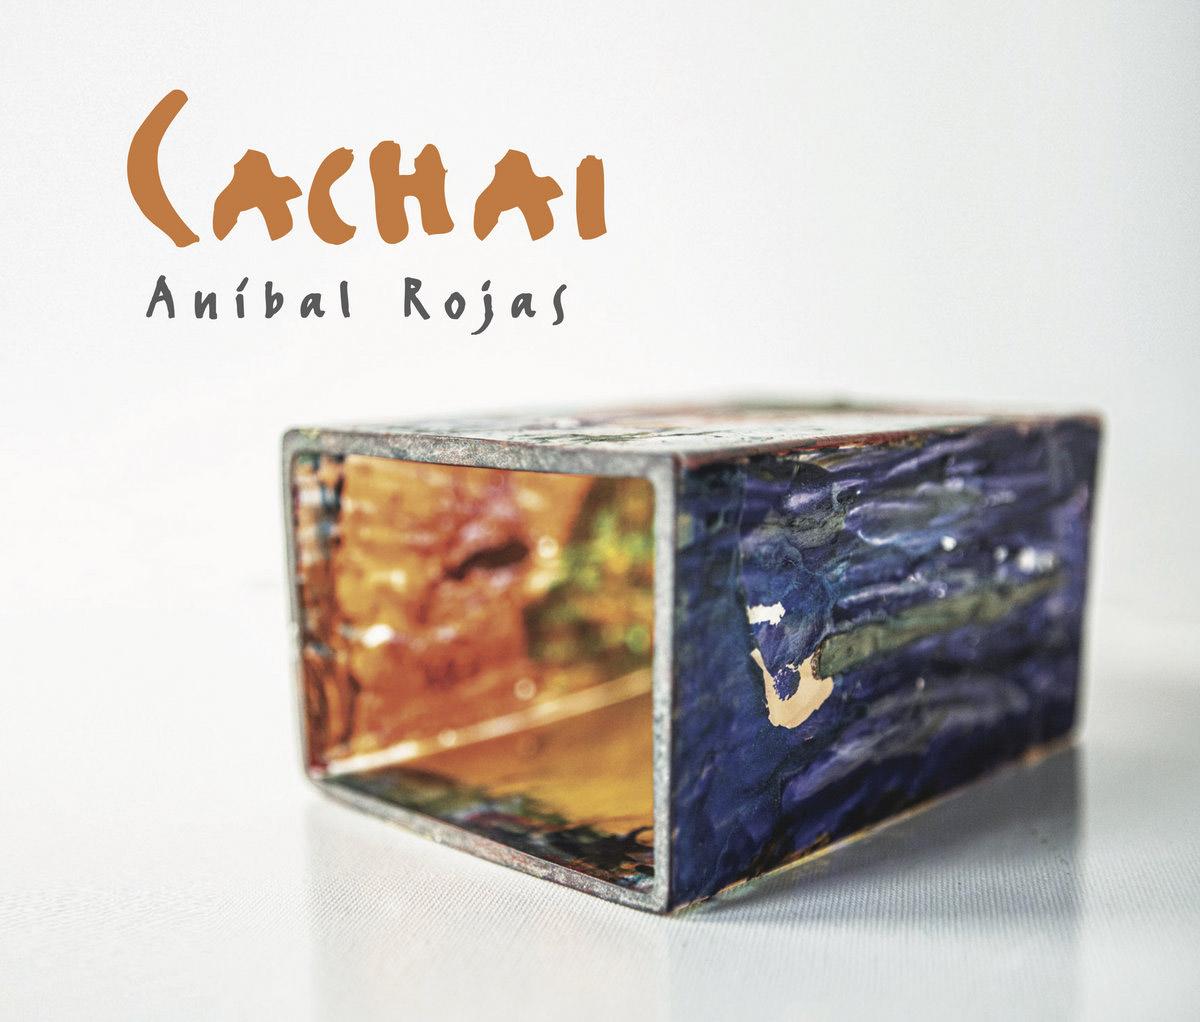 Anibal Roja - Cachai